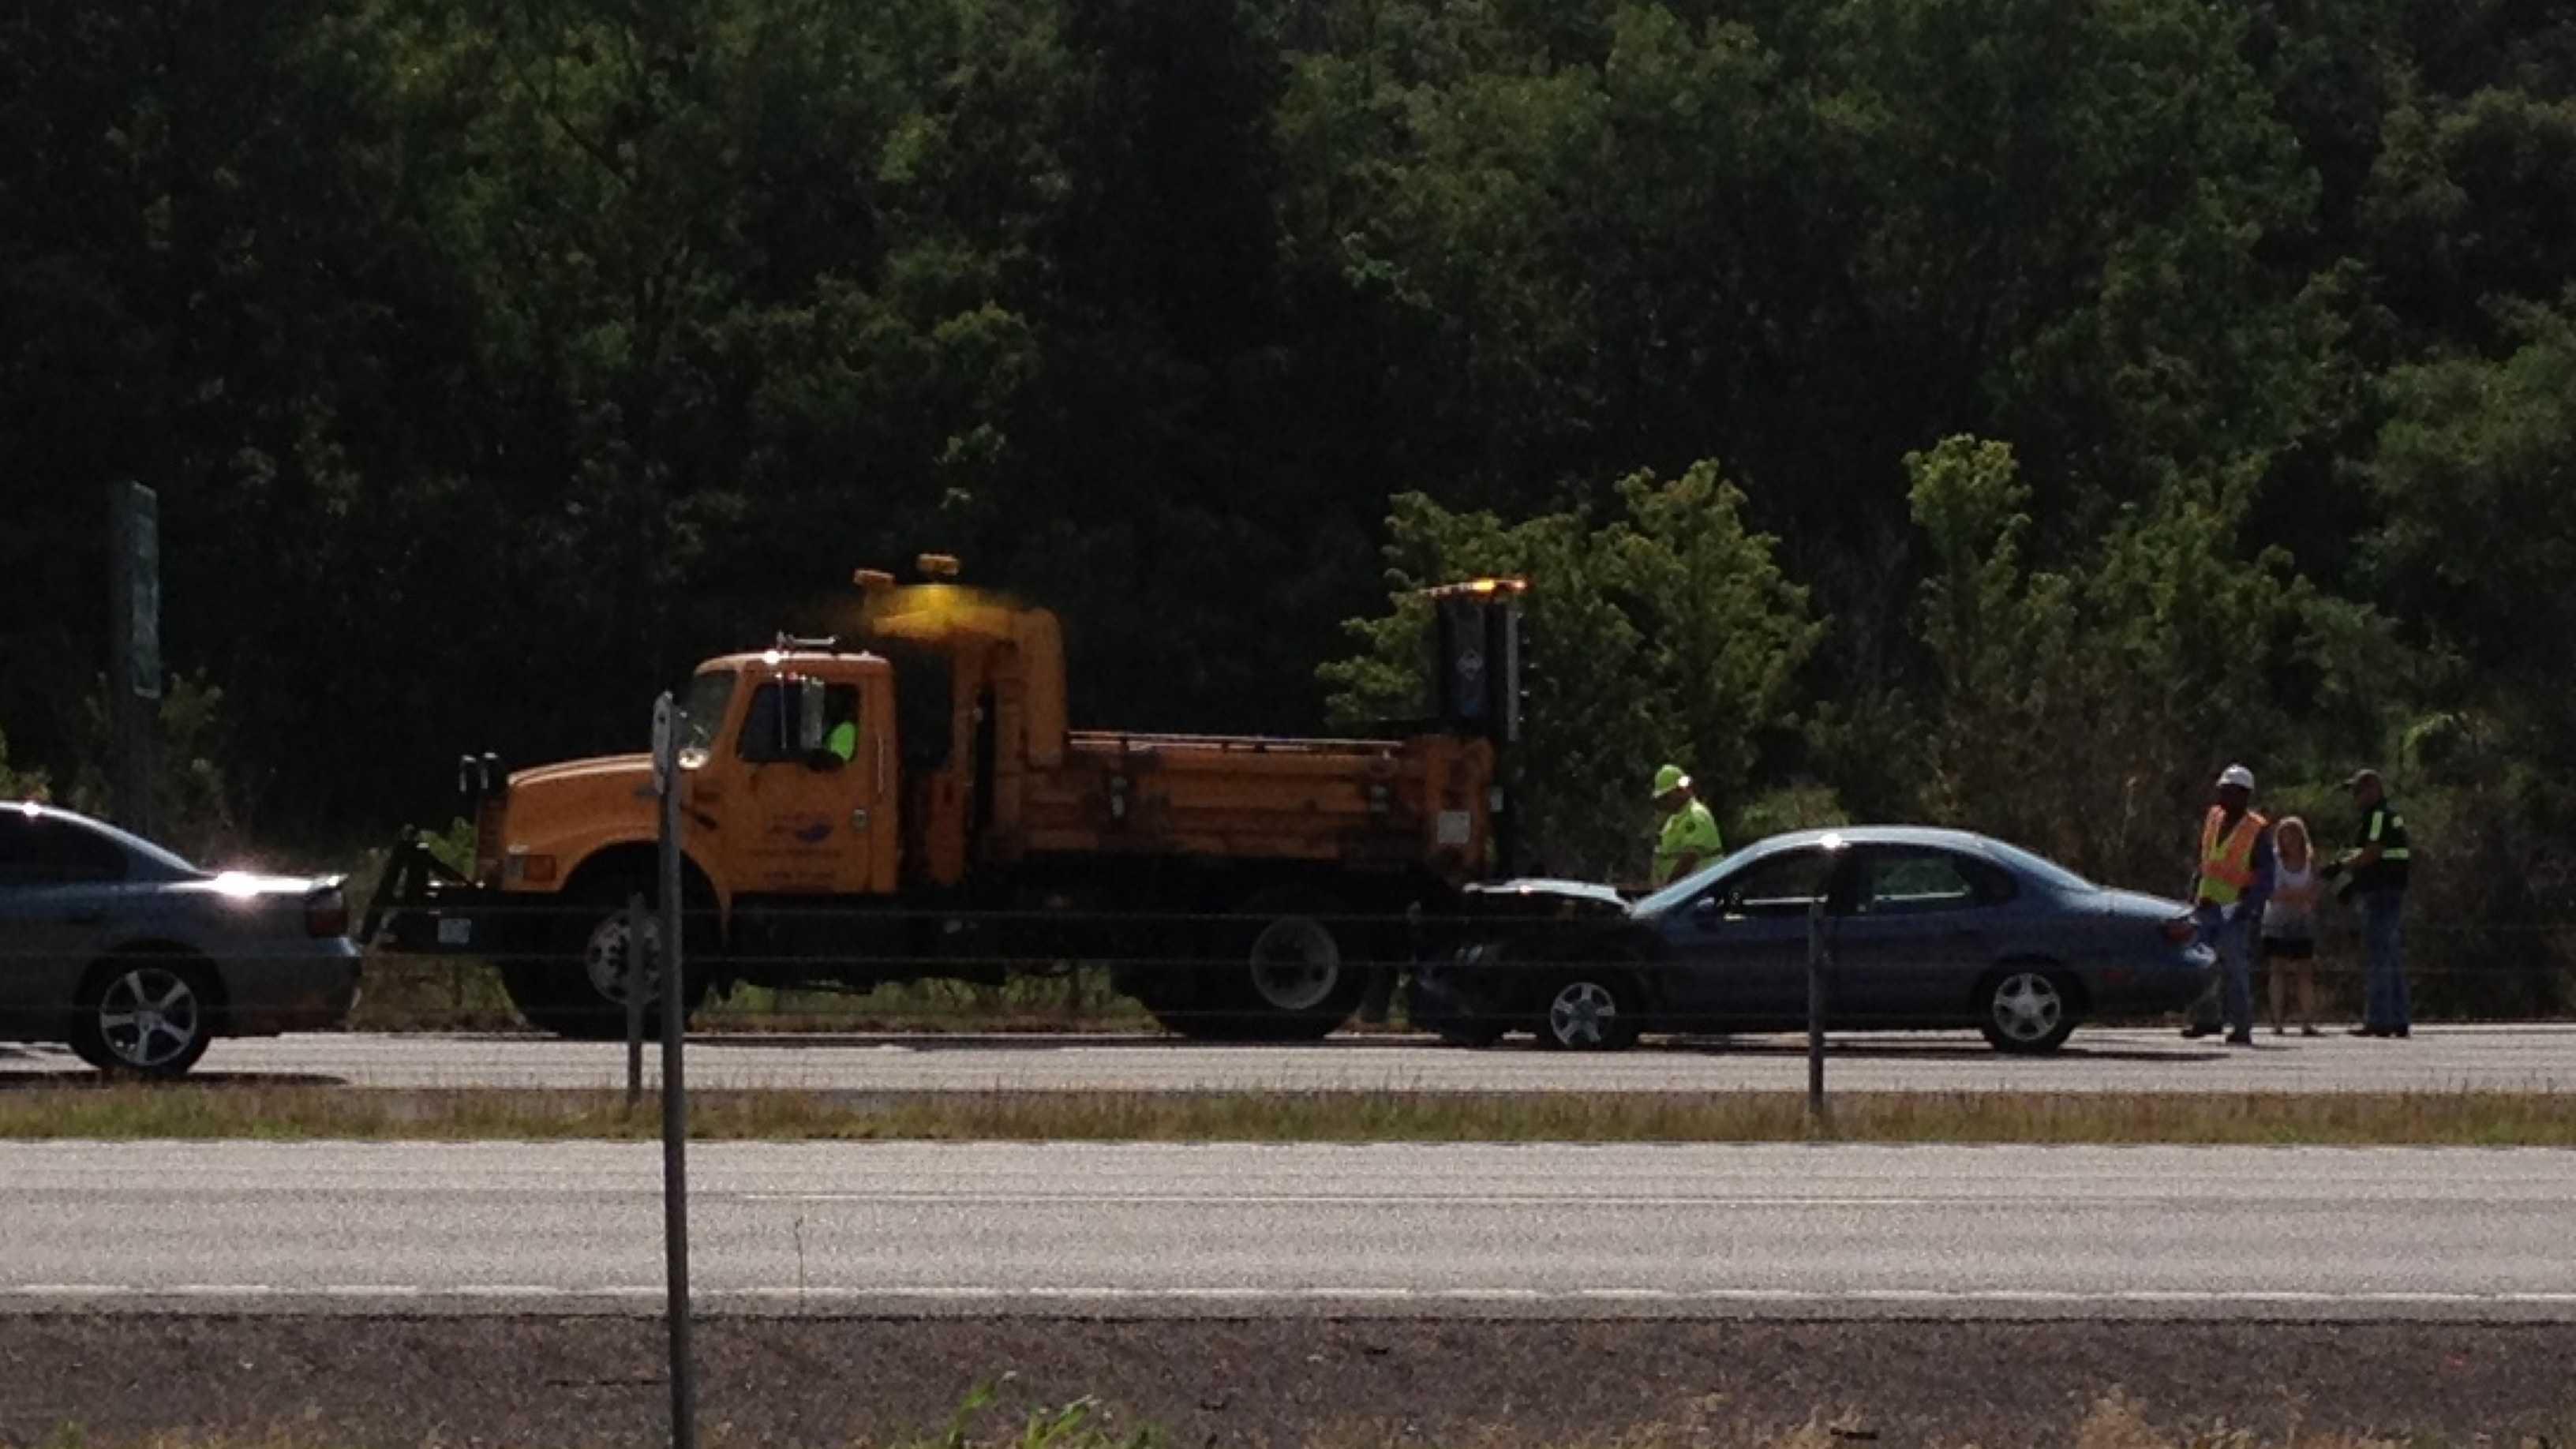 I-435, Truman Road, MoDOT truck rear-ended